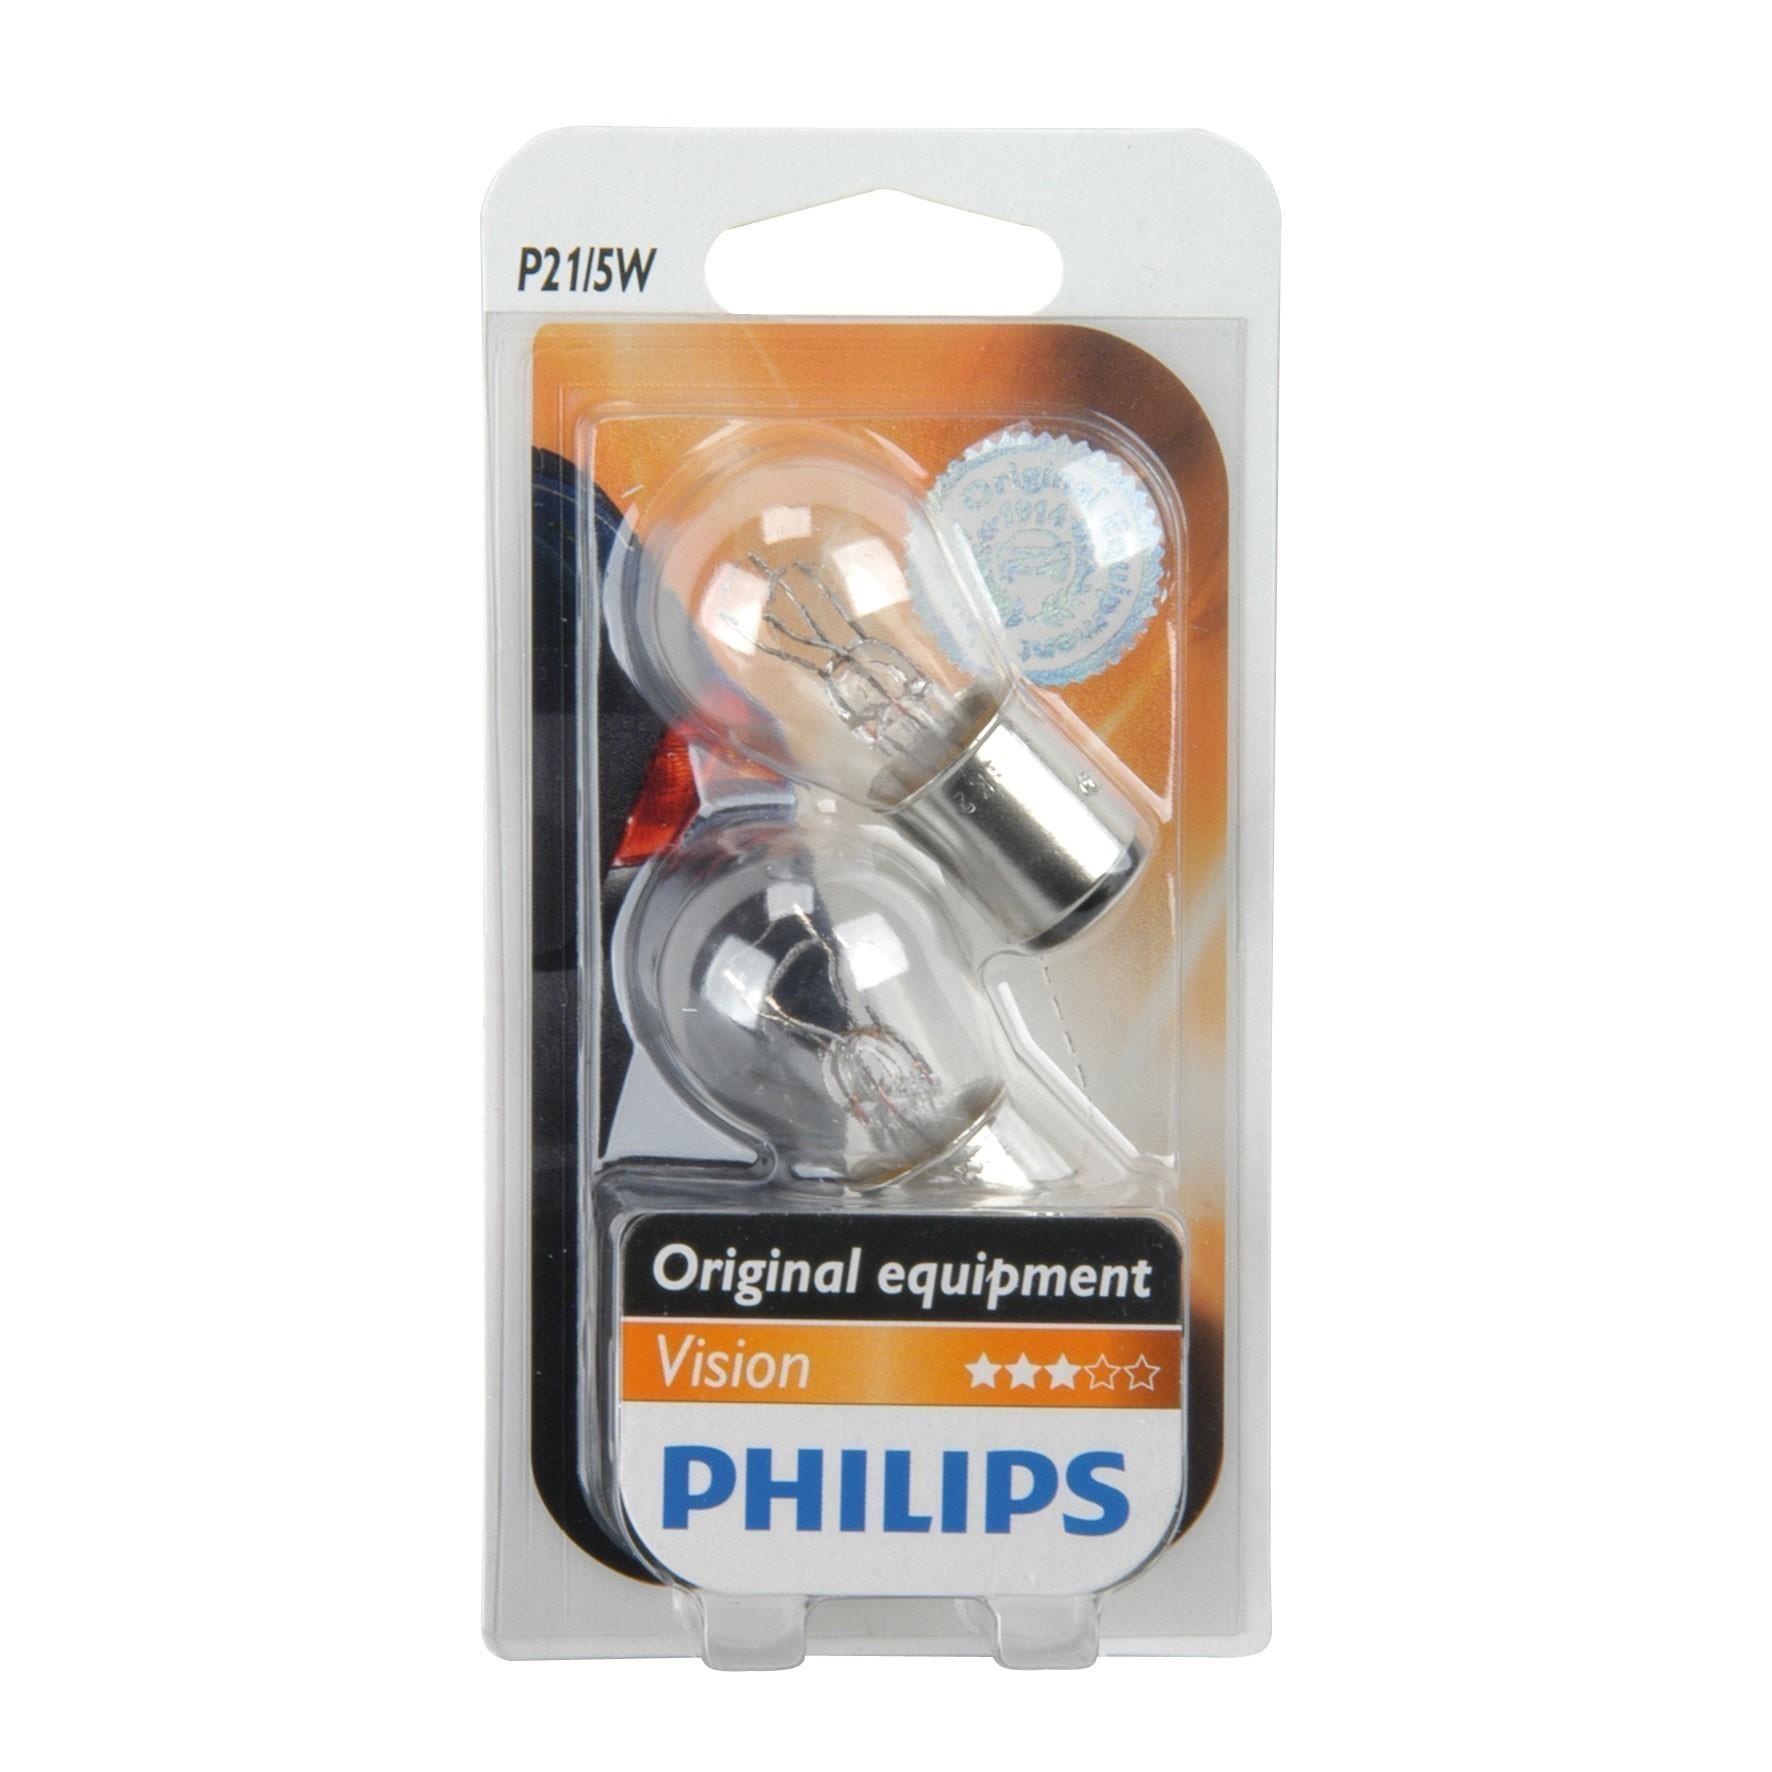 Philips Kugellampe P21 12Volt / 5Watt 2er Pack - Autobeleuchtung Bild 1